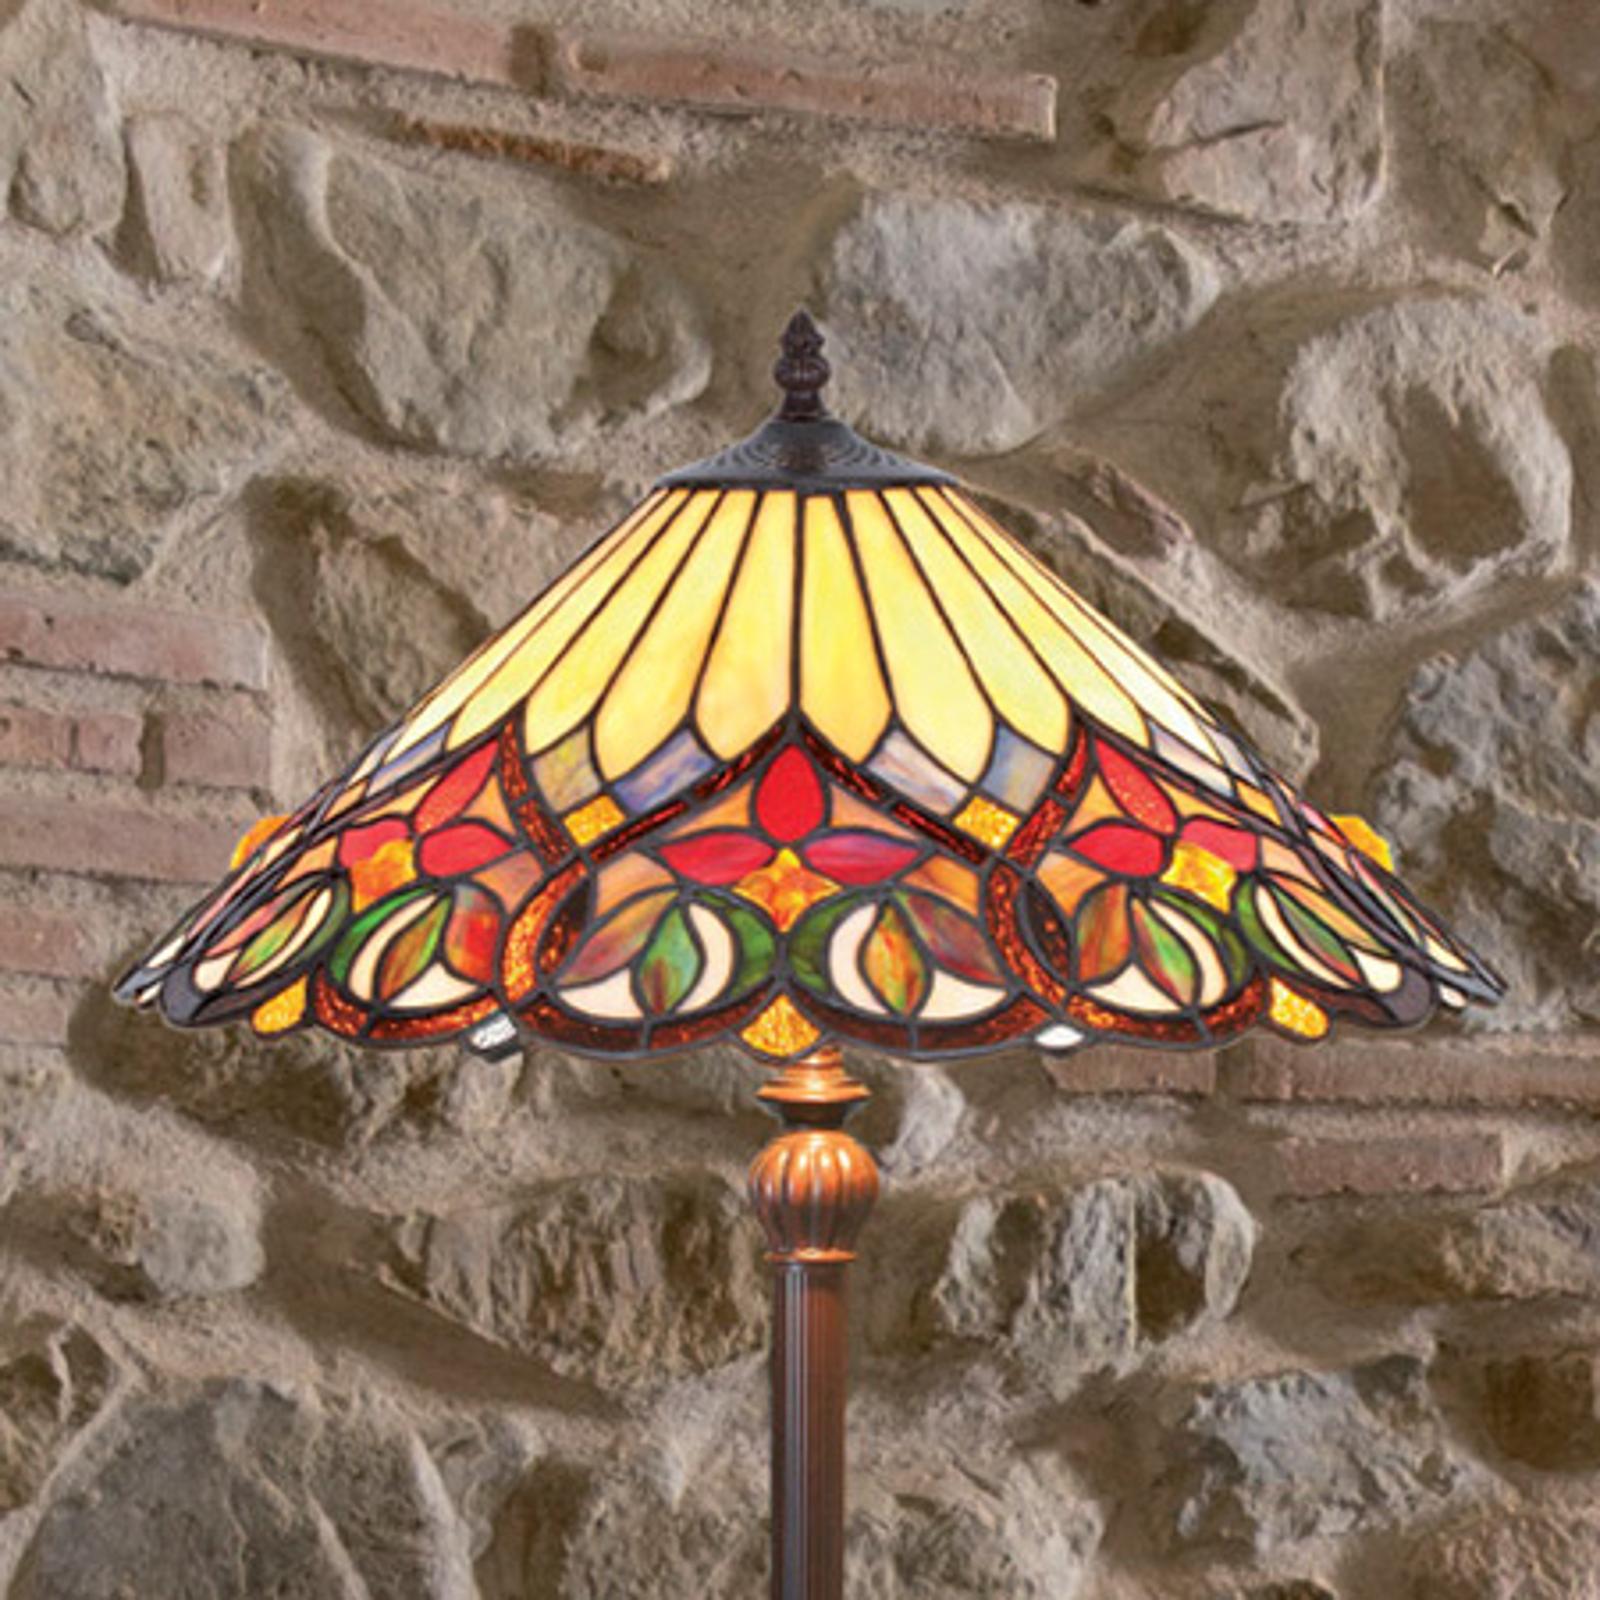 Tiltalende utfformet stålampe Anni